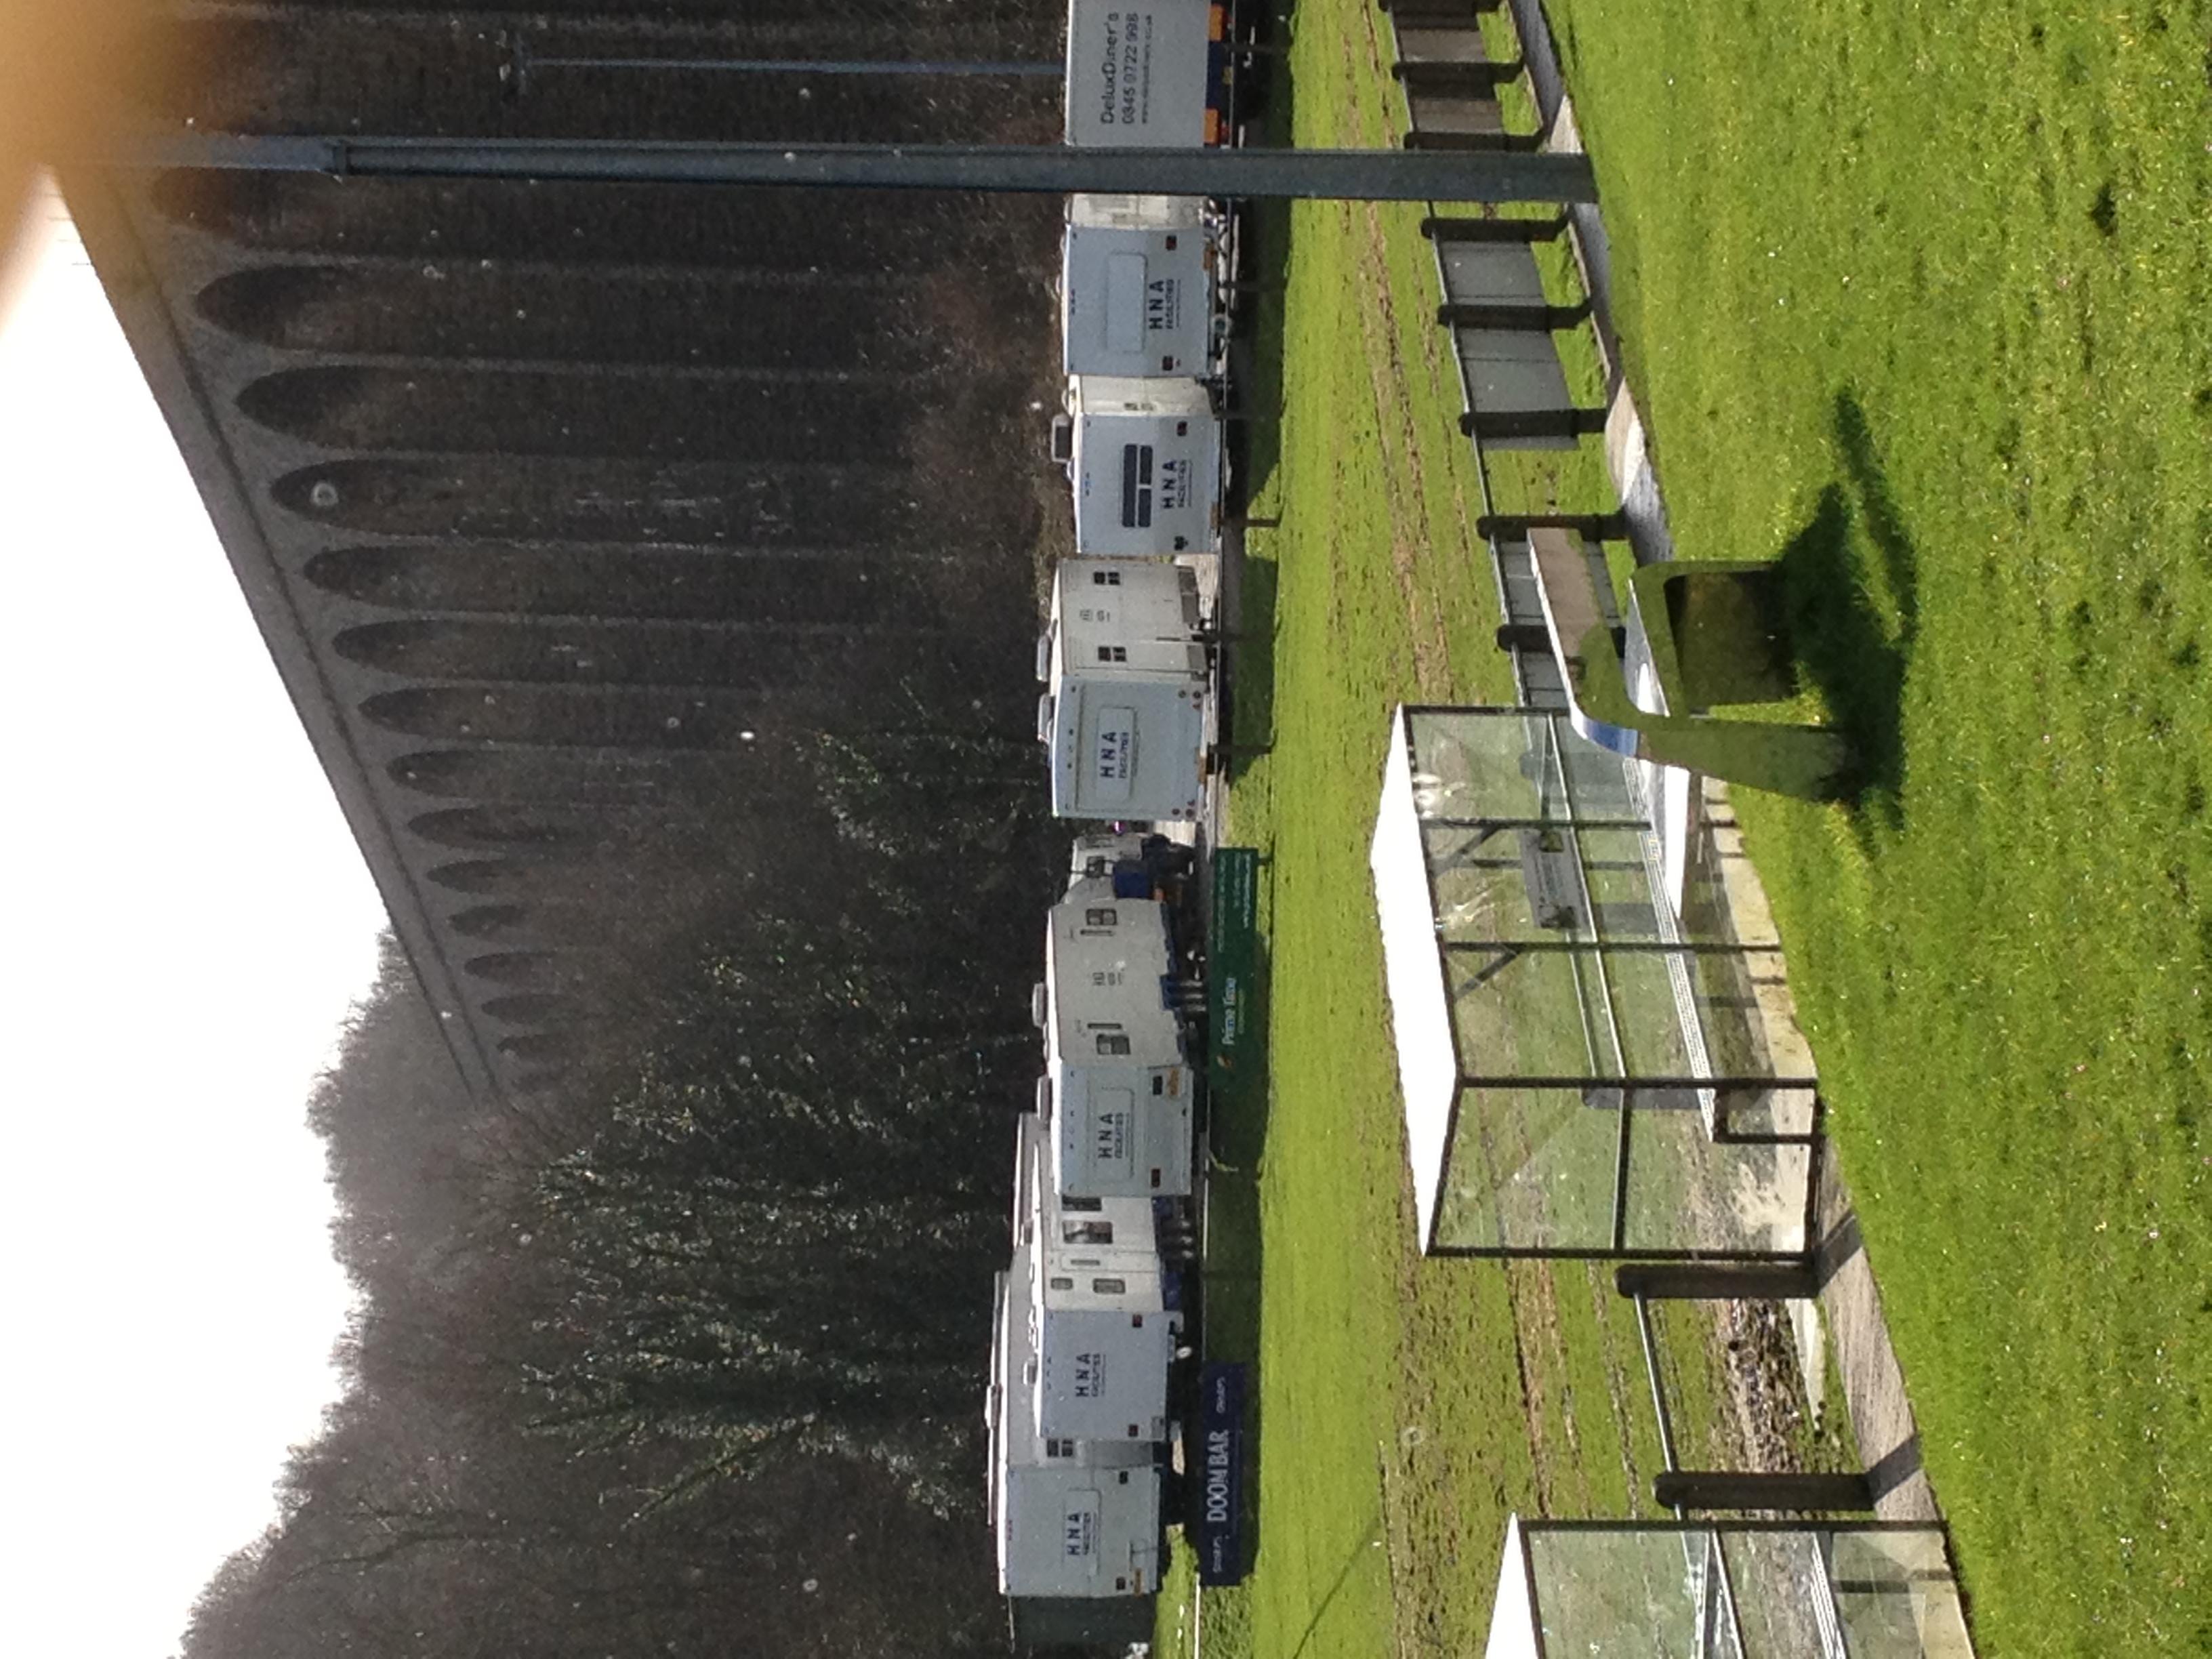 Unit base (Greenfield)